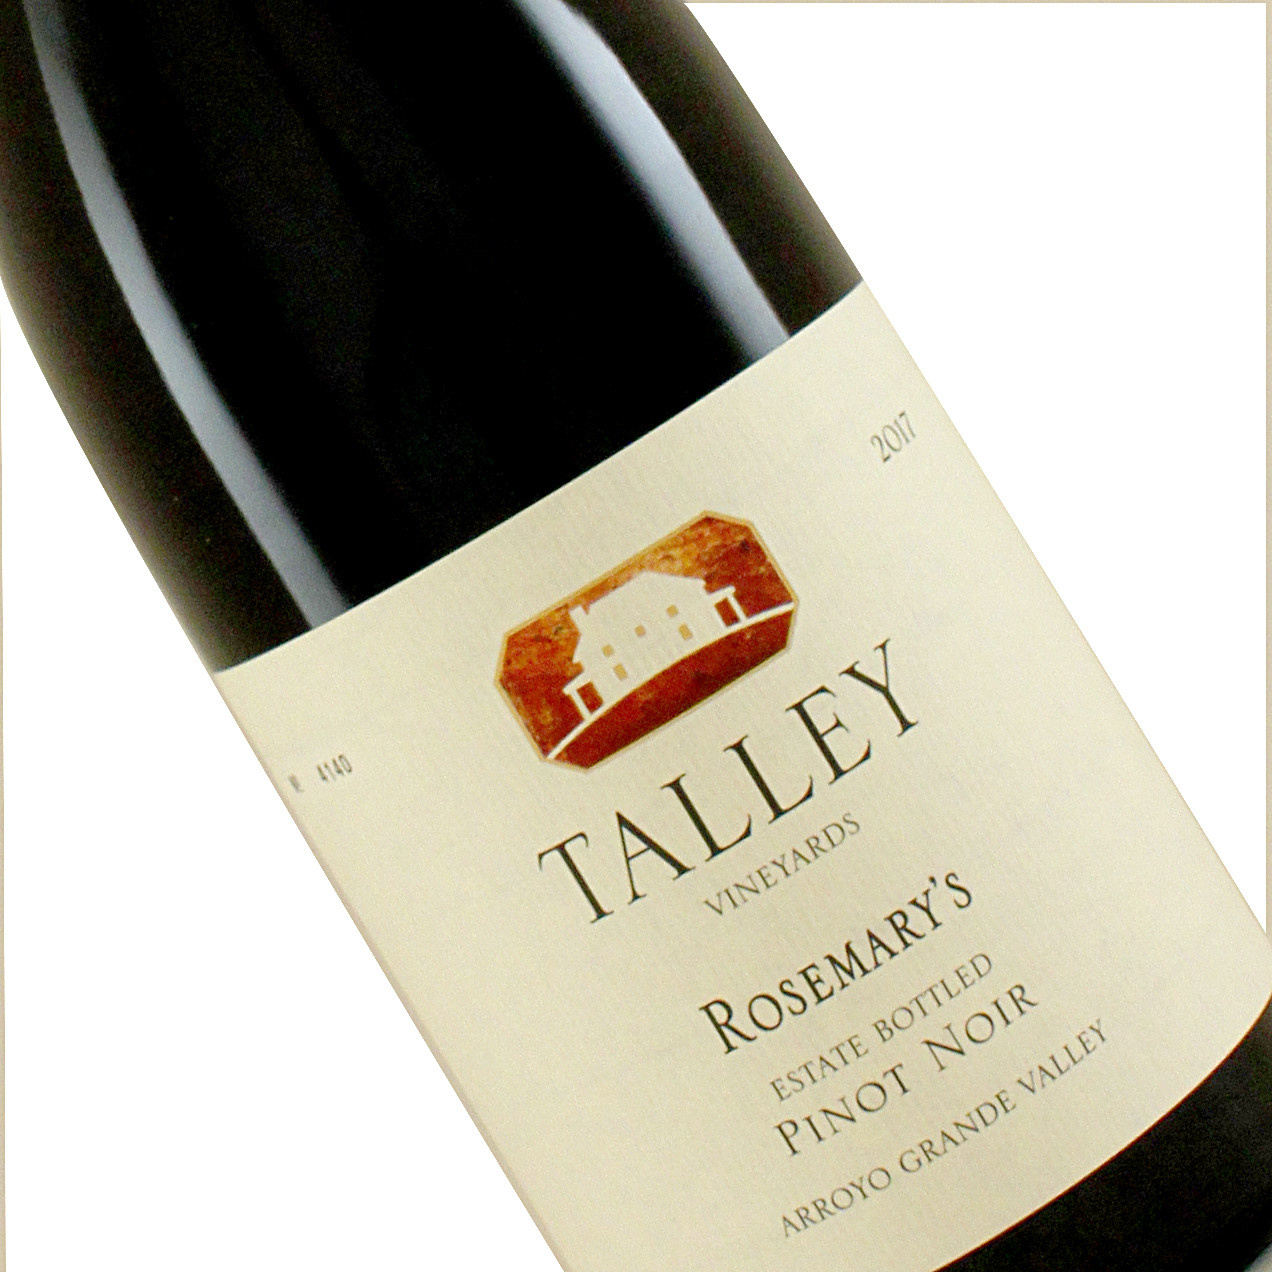 Talley 2017 Estate Pinot Noir Rosemary's Vineyard, Arroyo Grande Valley, California